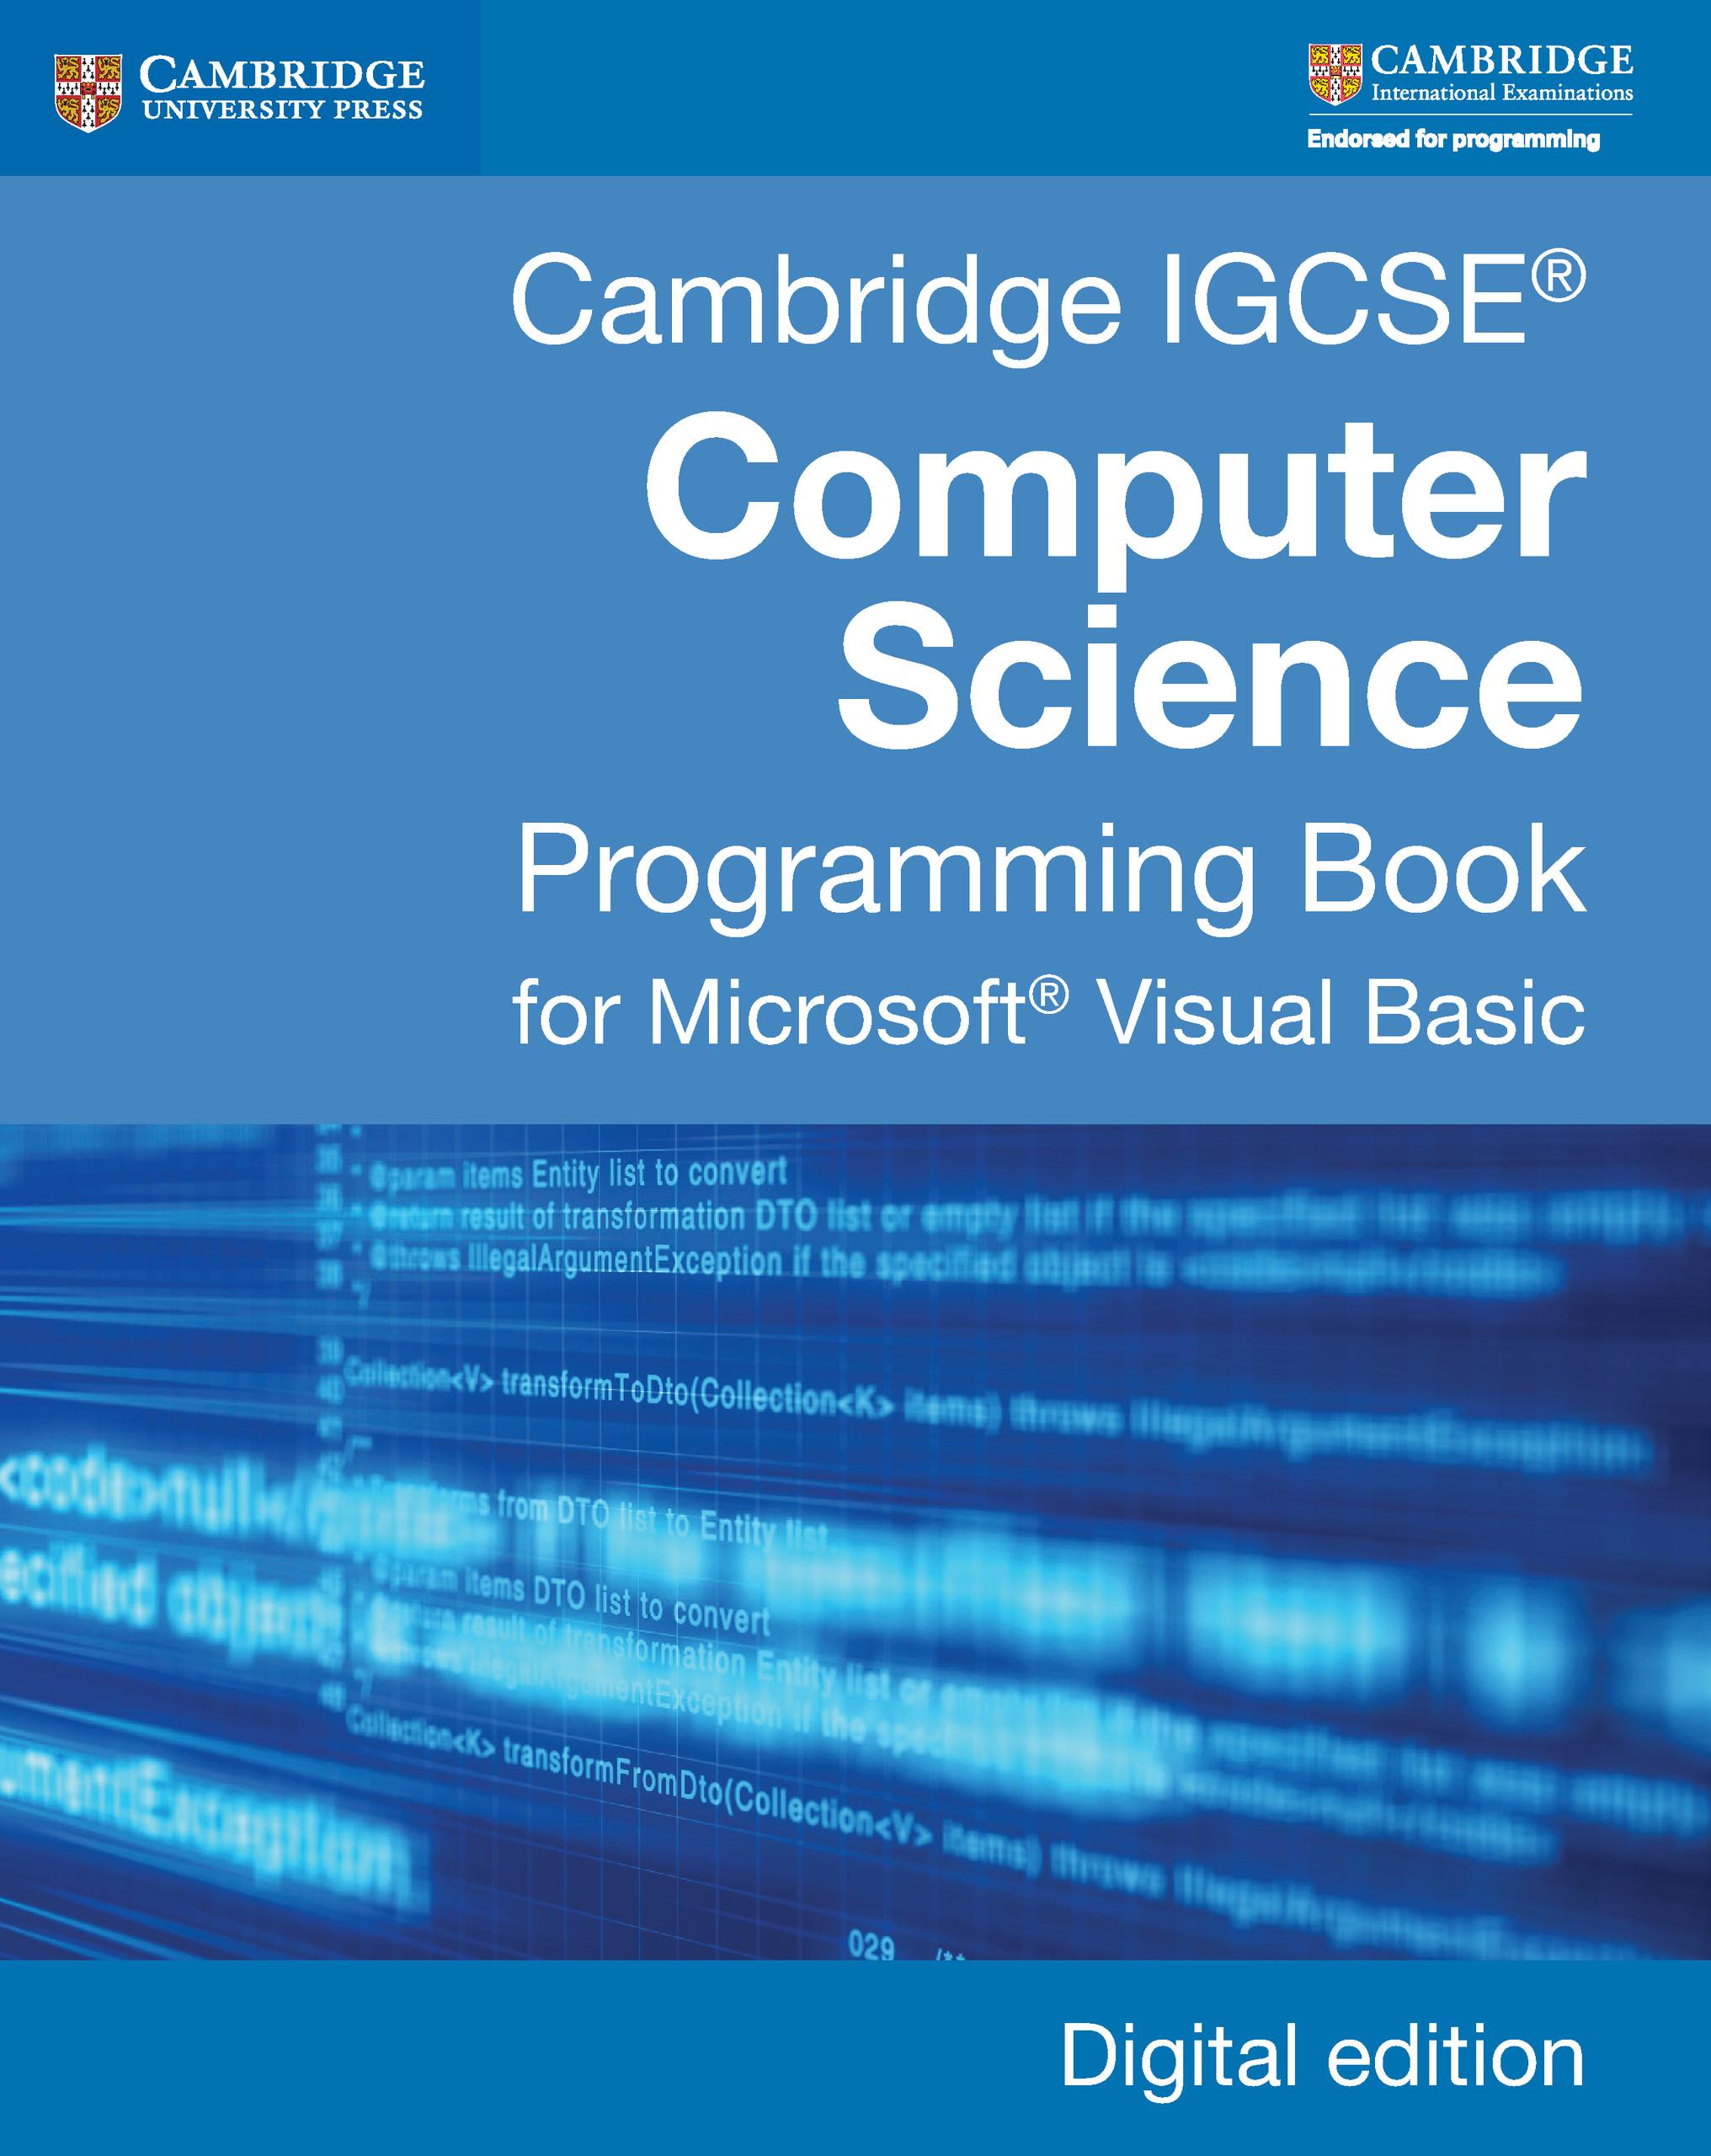 Cambridge IGCSE® Computer Science Programming Book Digital edition